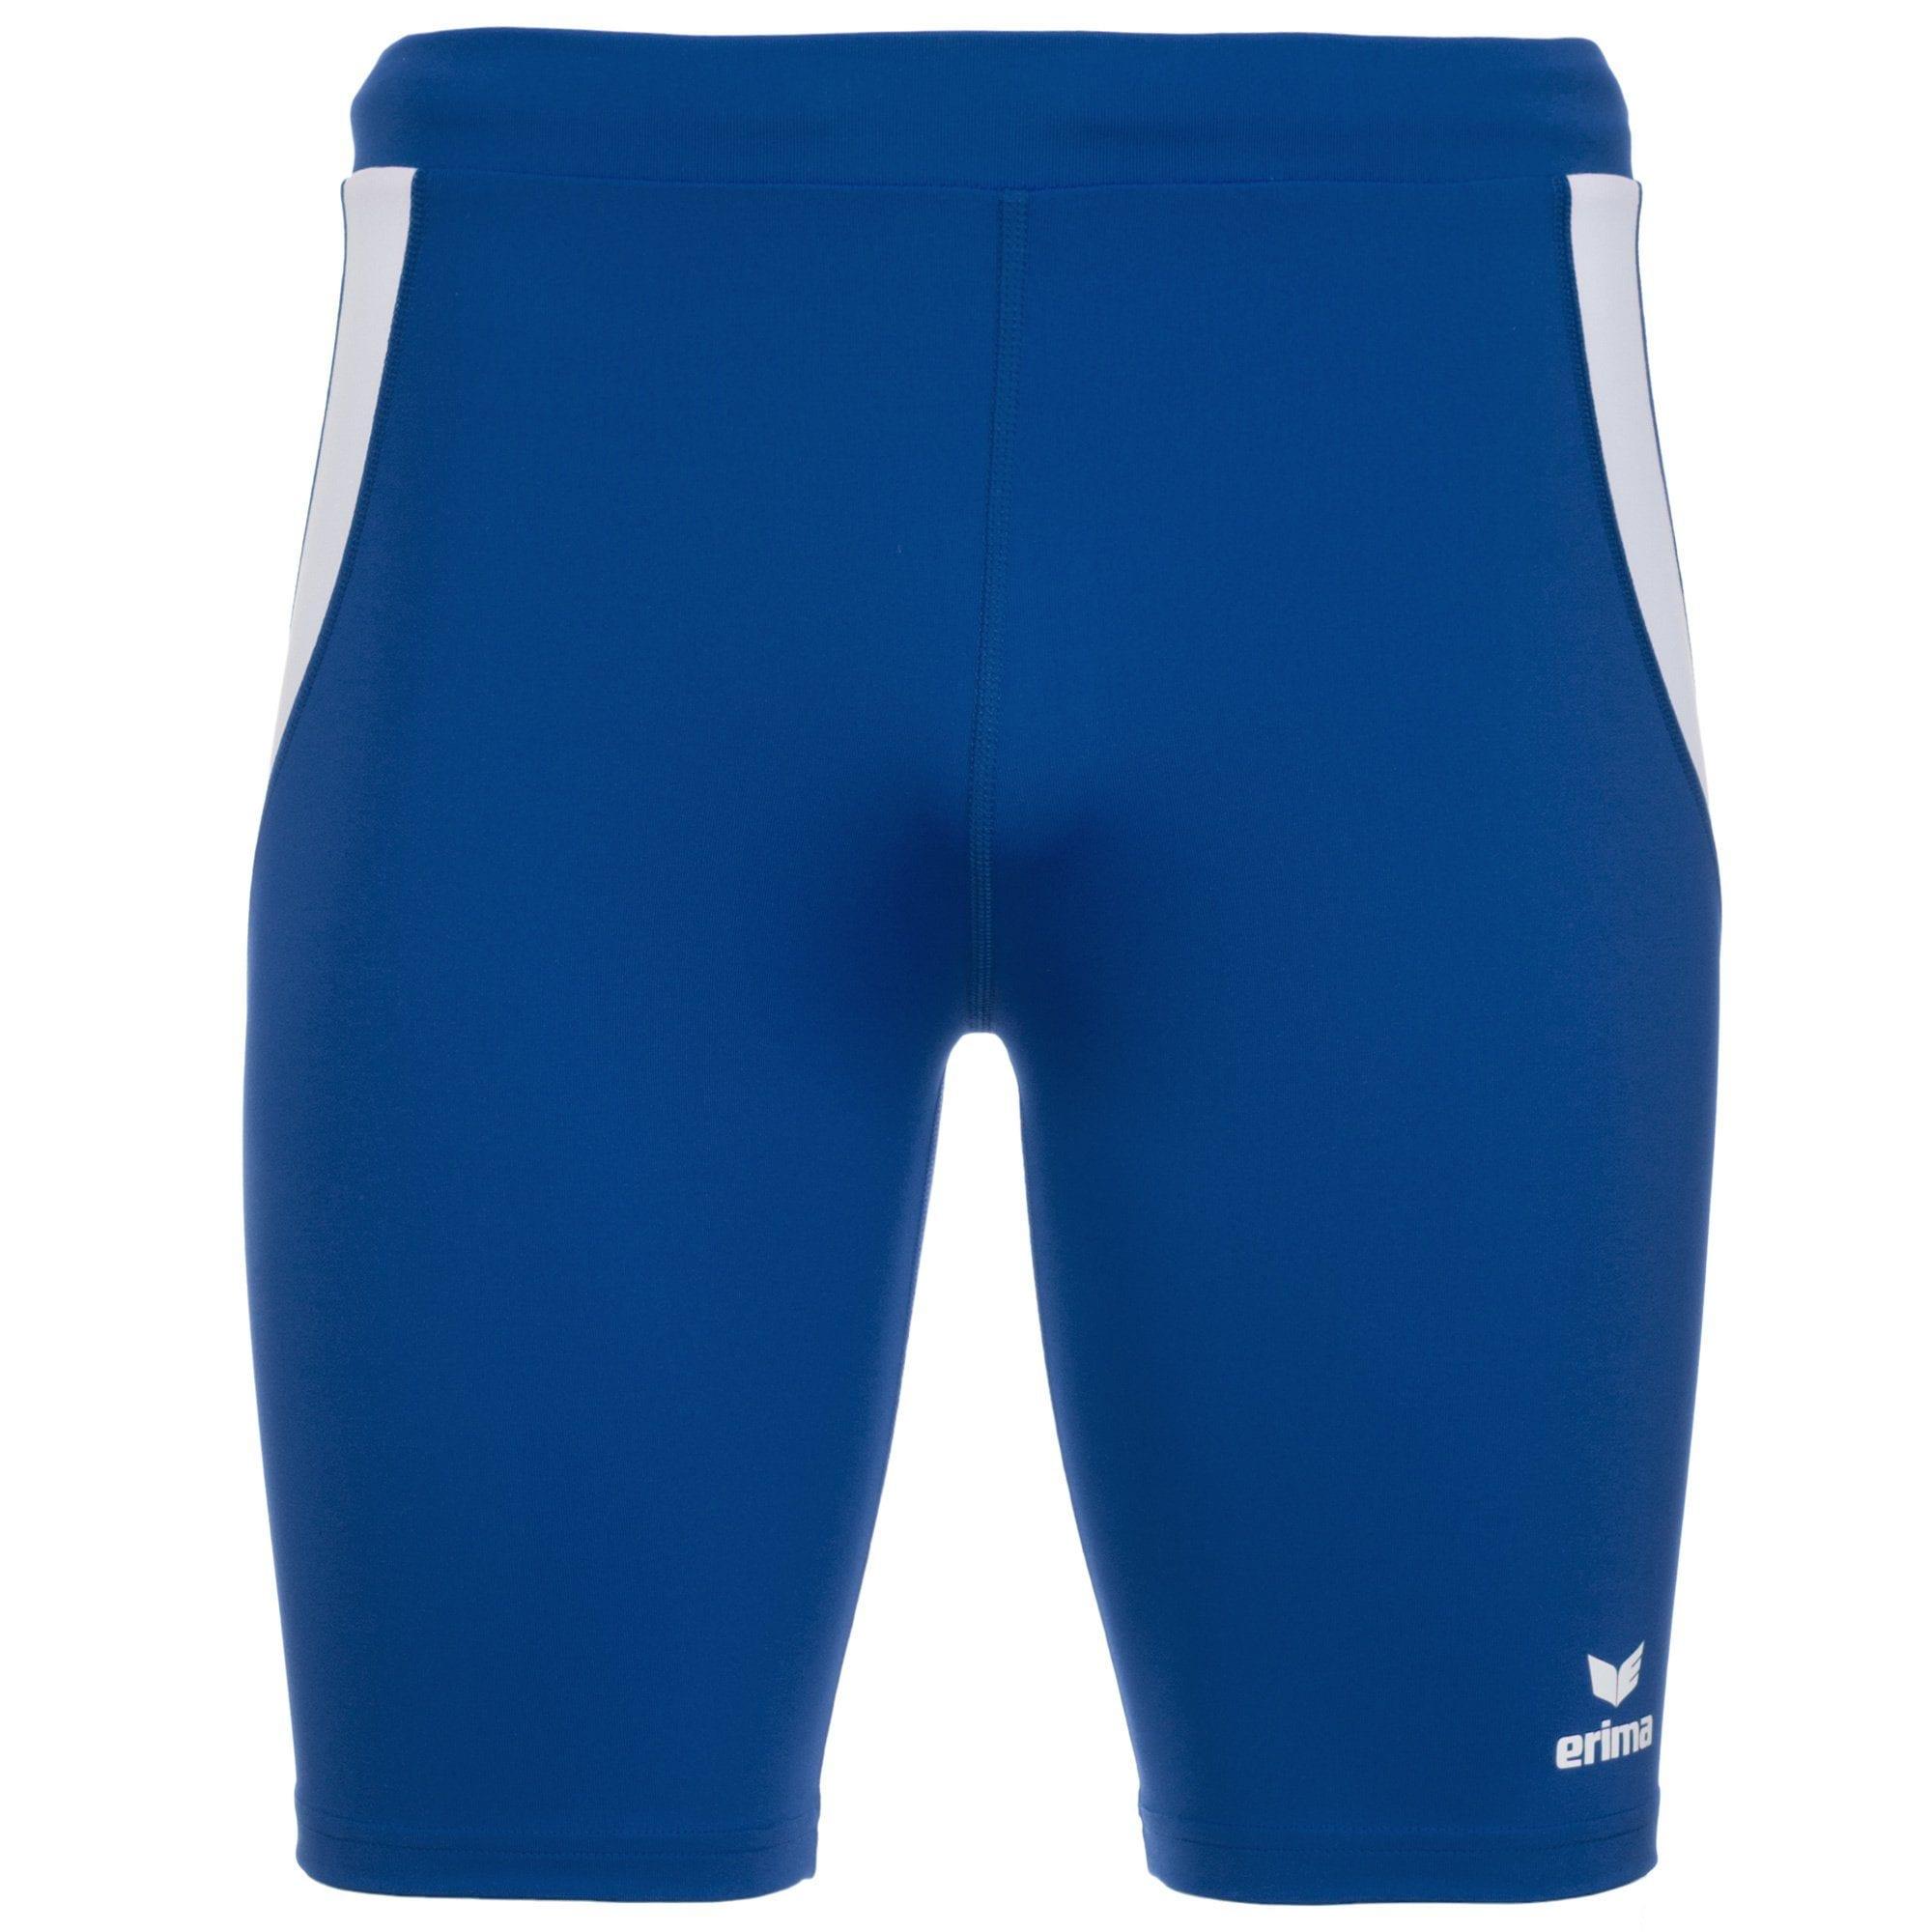 Erima Short Tight Herren | Sportbekleidung > Sporthosen | Blau | Polyester - Elasthan | Erima